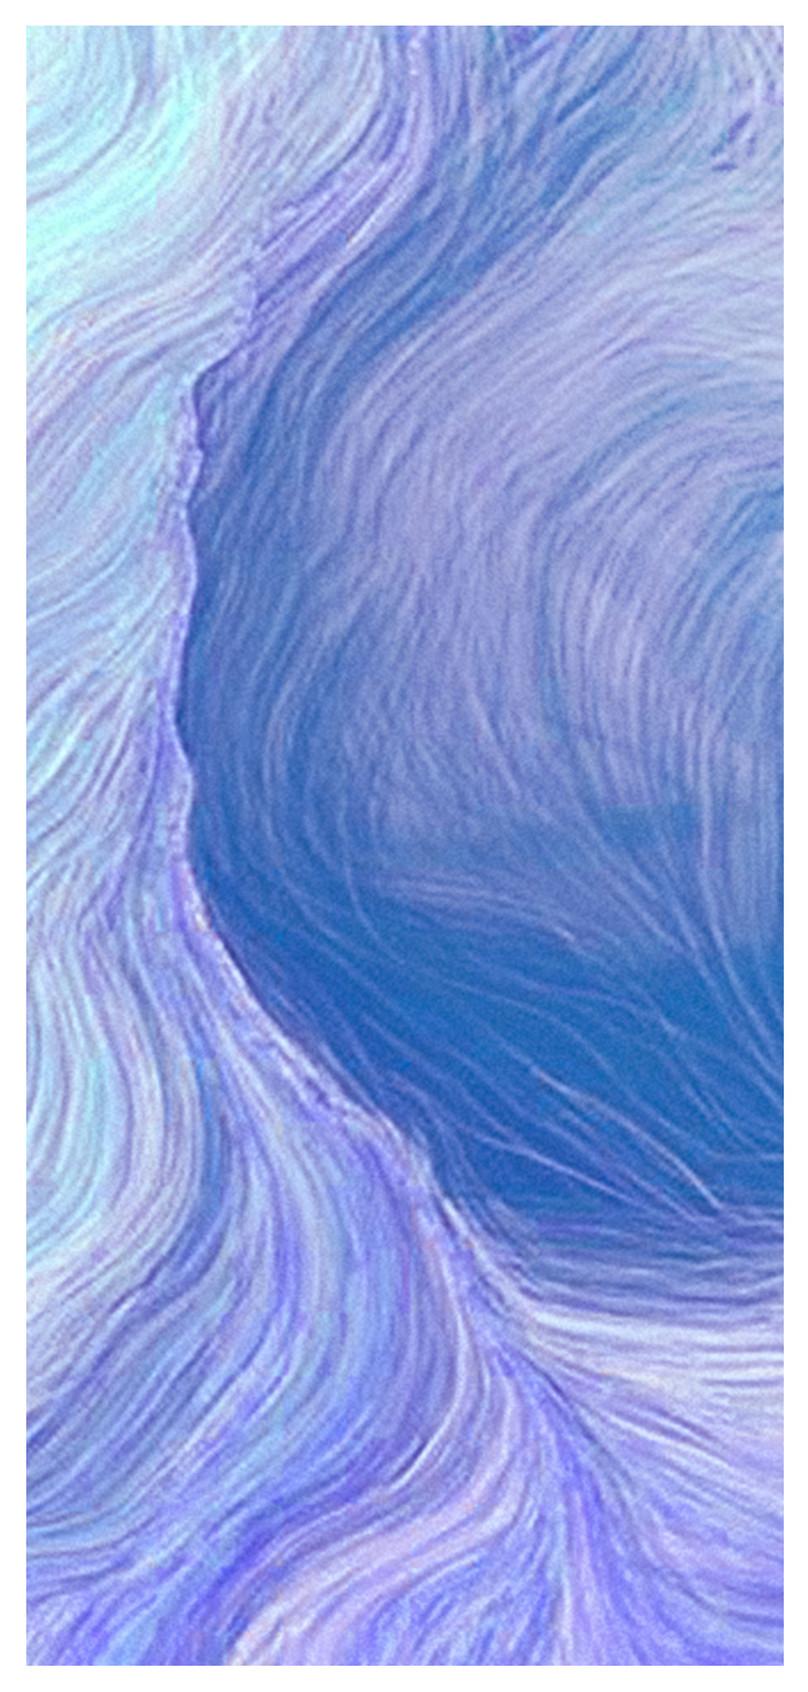 Lukisan Minyak Abstrak Wallpaper Ponsel Gambar Unduh Gratis